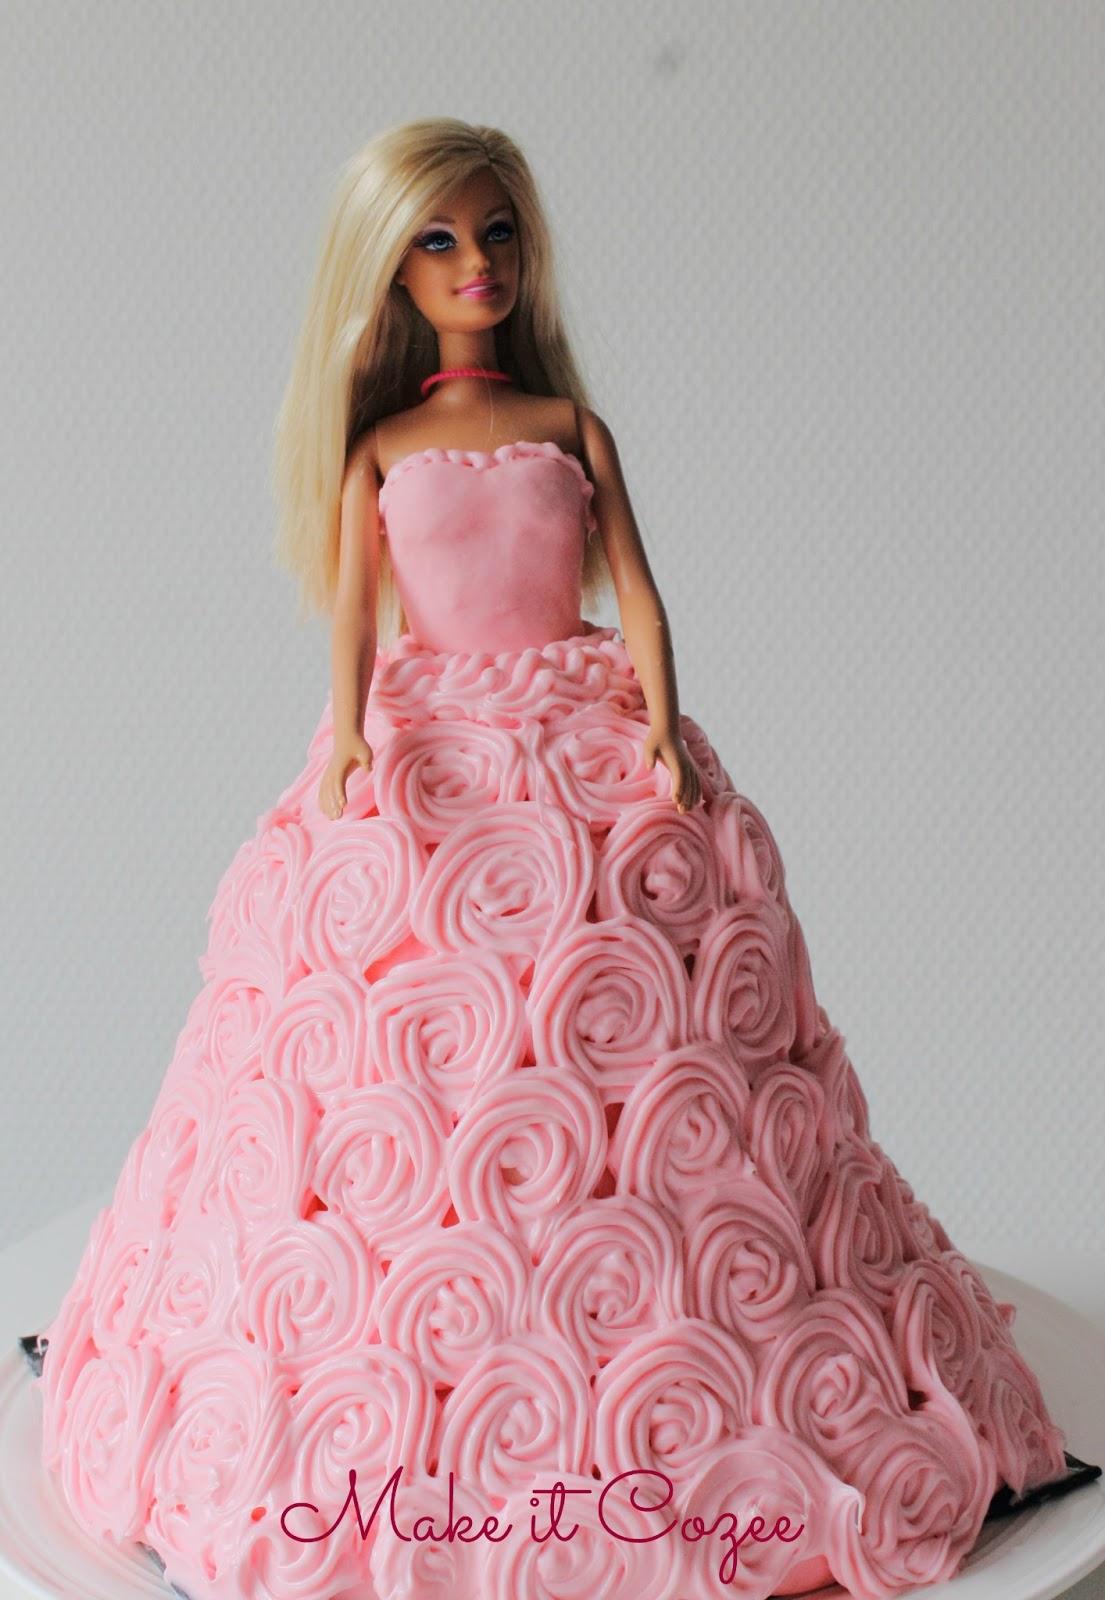 Barbie Doll Cake Tutorial